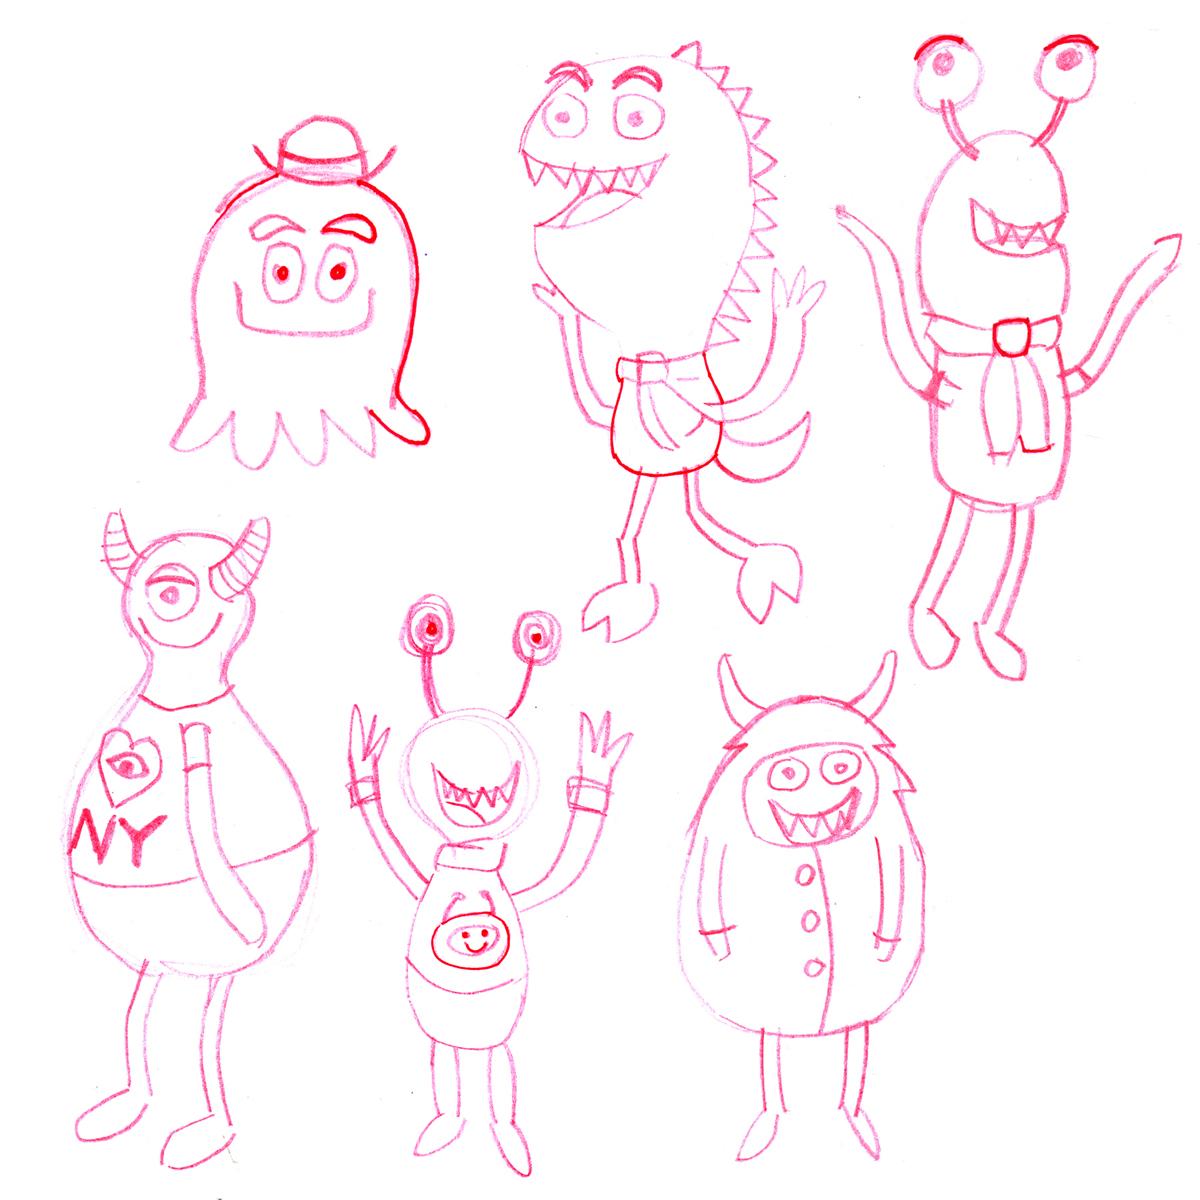 cute-monster-character-illustration3-emmajayne-designs